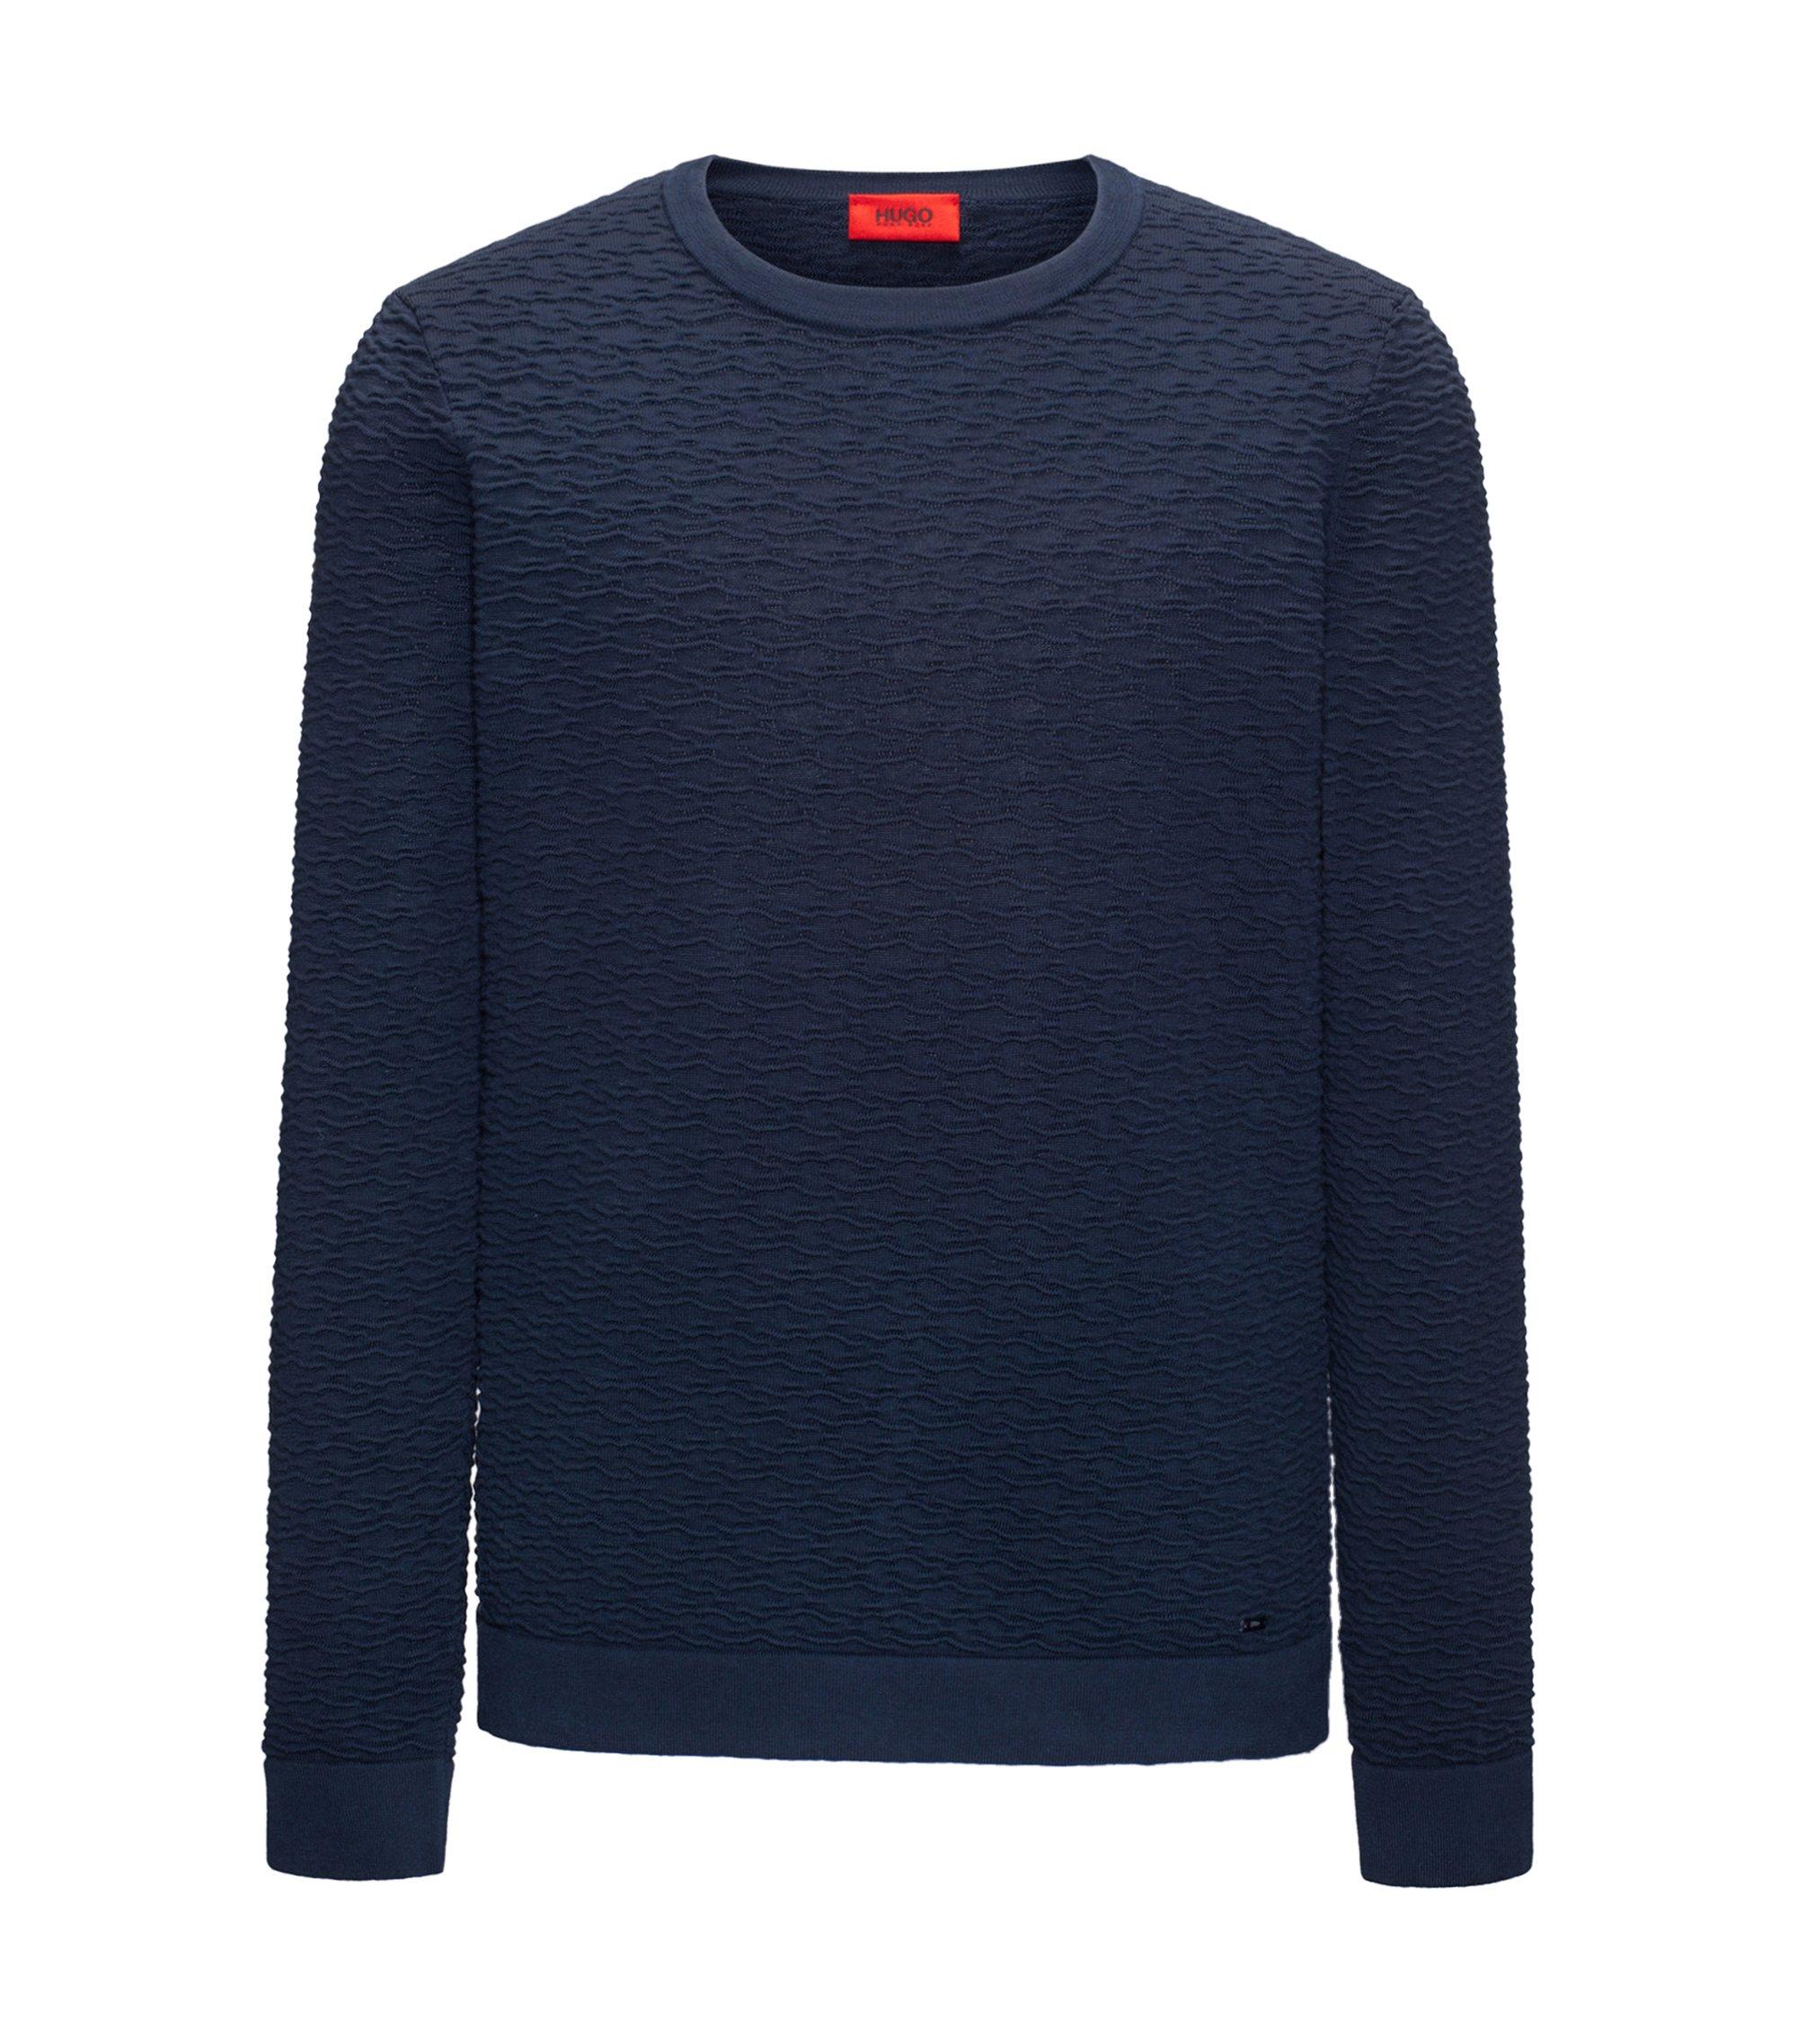 Crew-neck sweater in 3D-textured cotton jacquard , Dark Blue